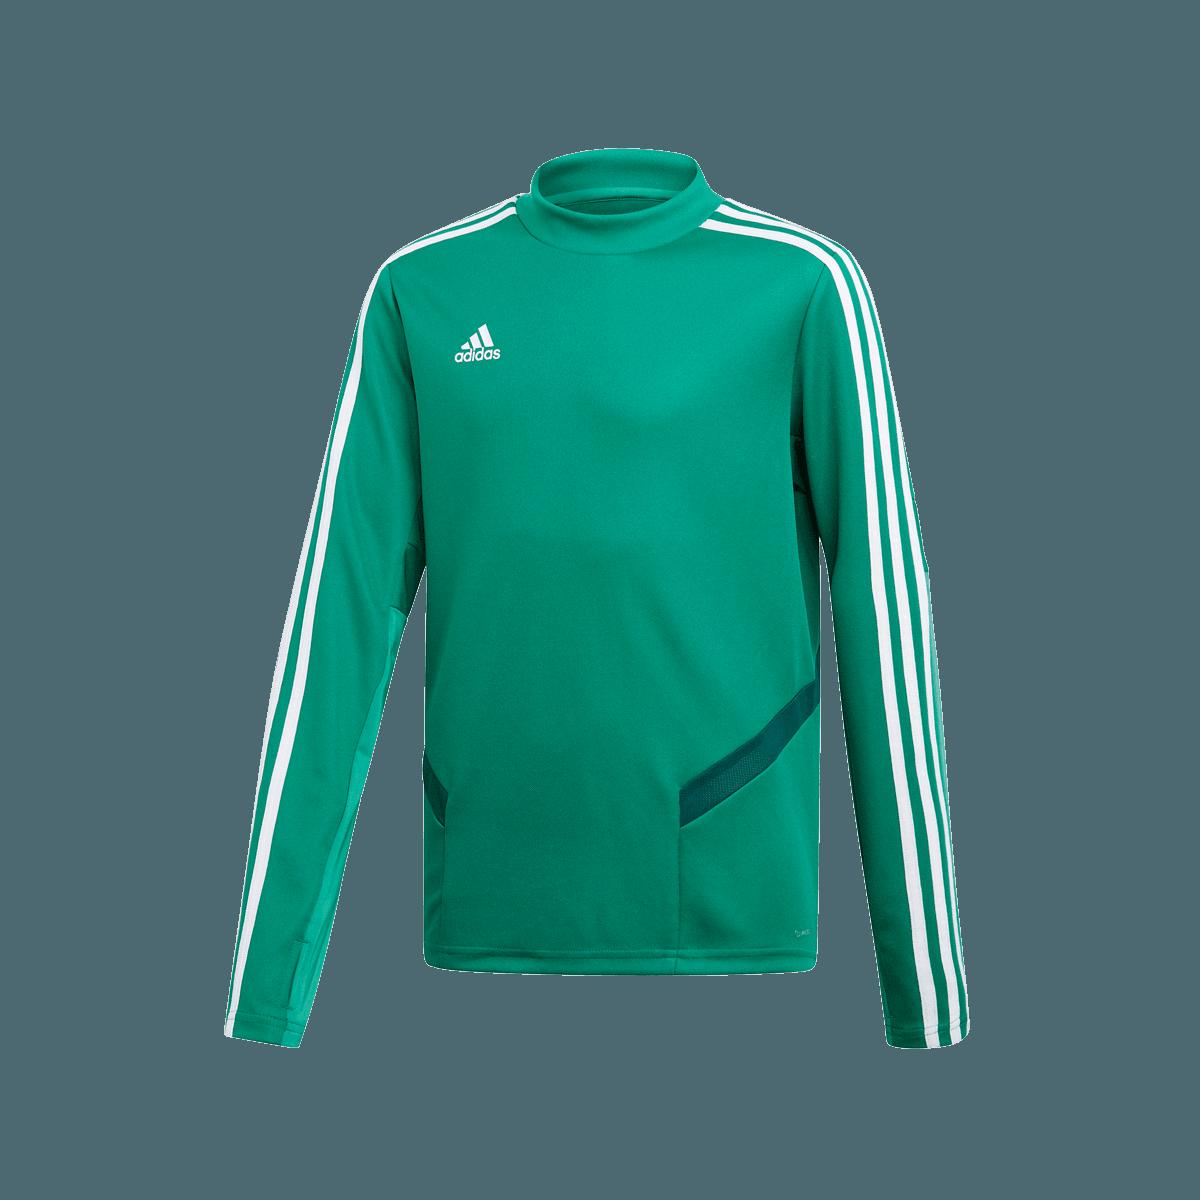 adidas Kinder Sweater Tiro 19 Training Top grünweiß